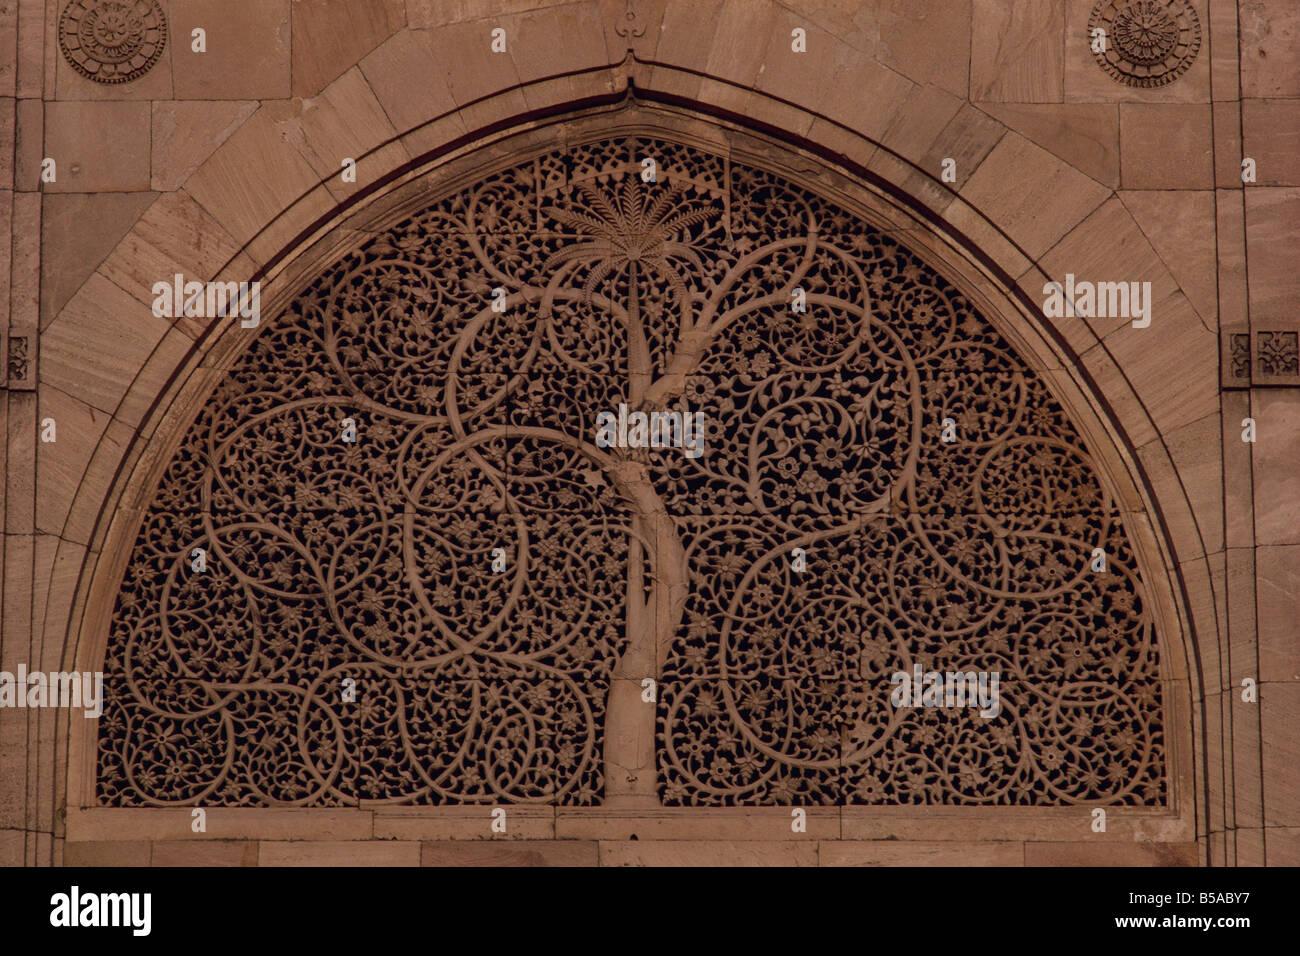 Close up of carved stone window Sidi Saiyad Mosque Ahmedabad Gujarat state India Asia - Stock Image